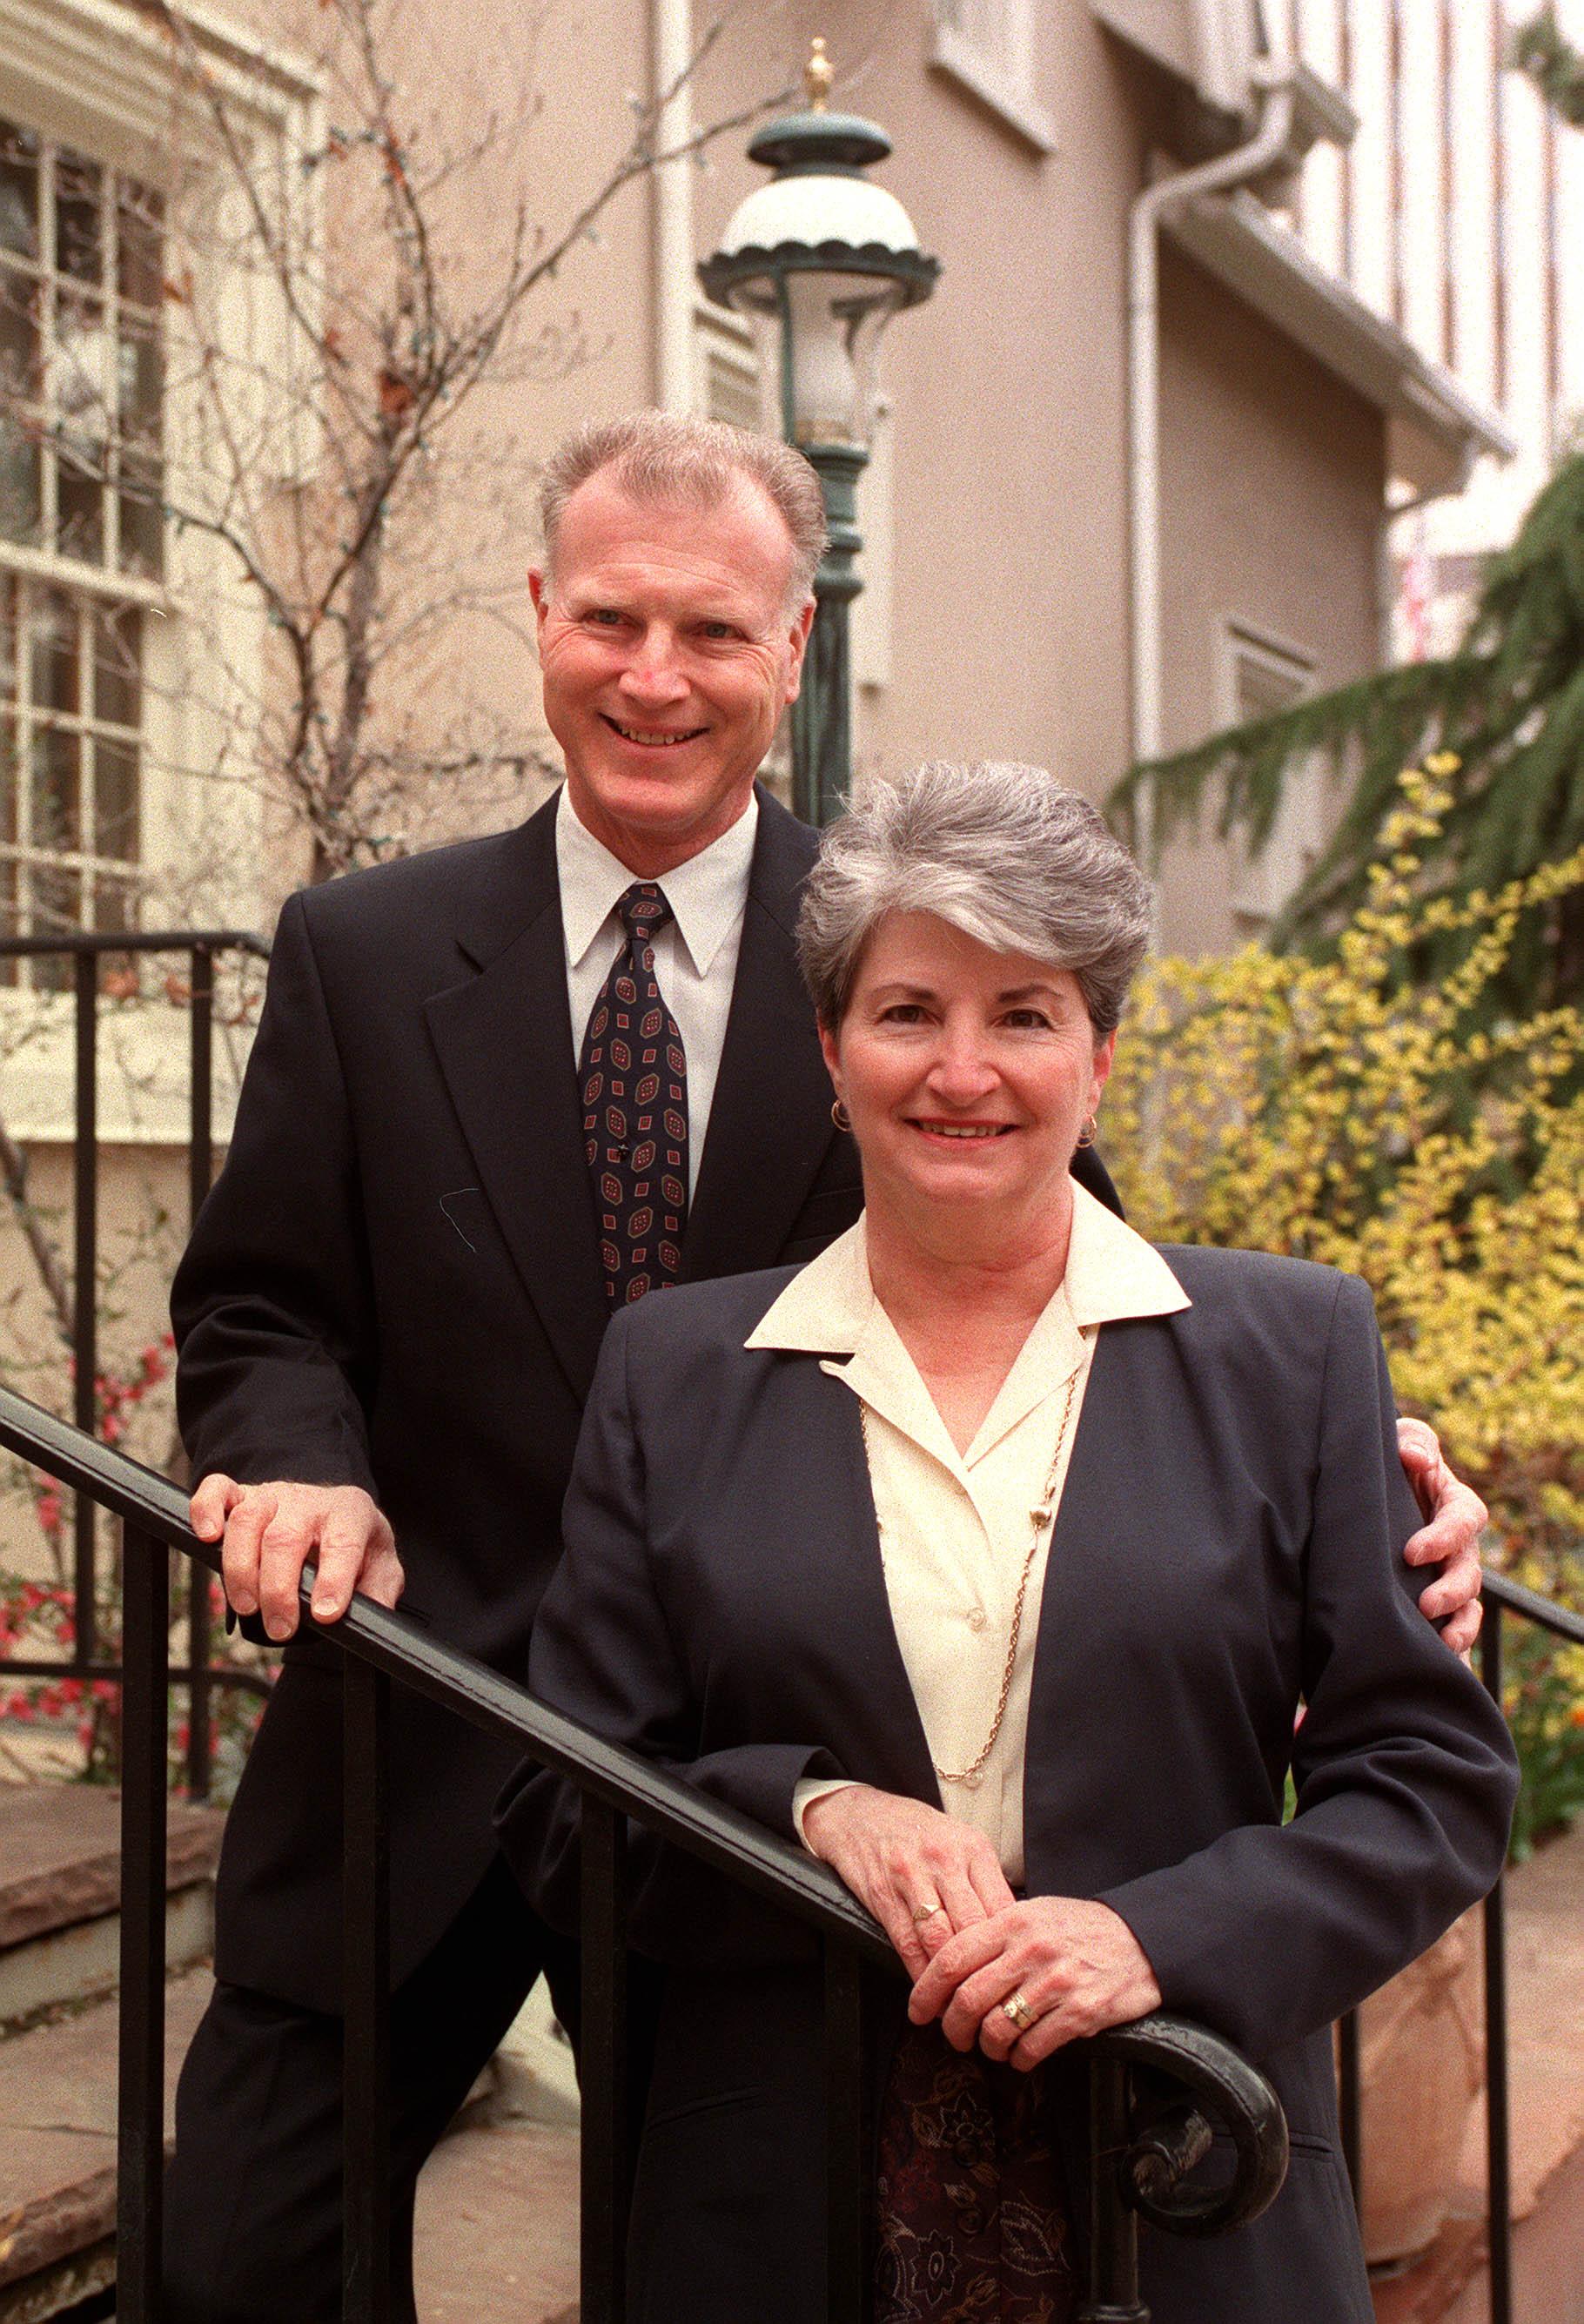 Elder H. Bruce Stucki and his wife, Sister Cheryl Stucki, in 1999.